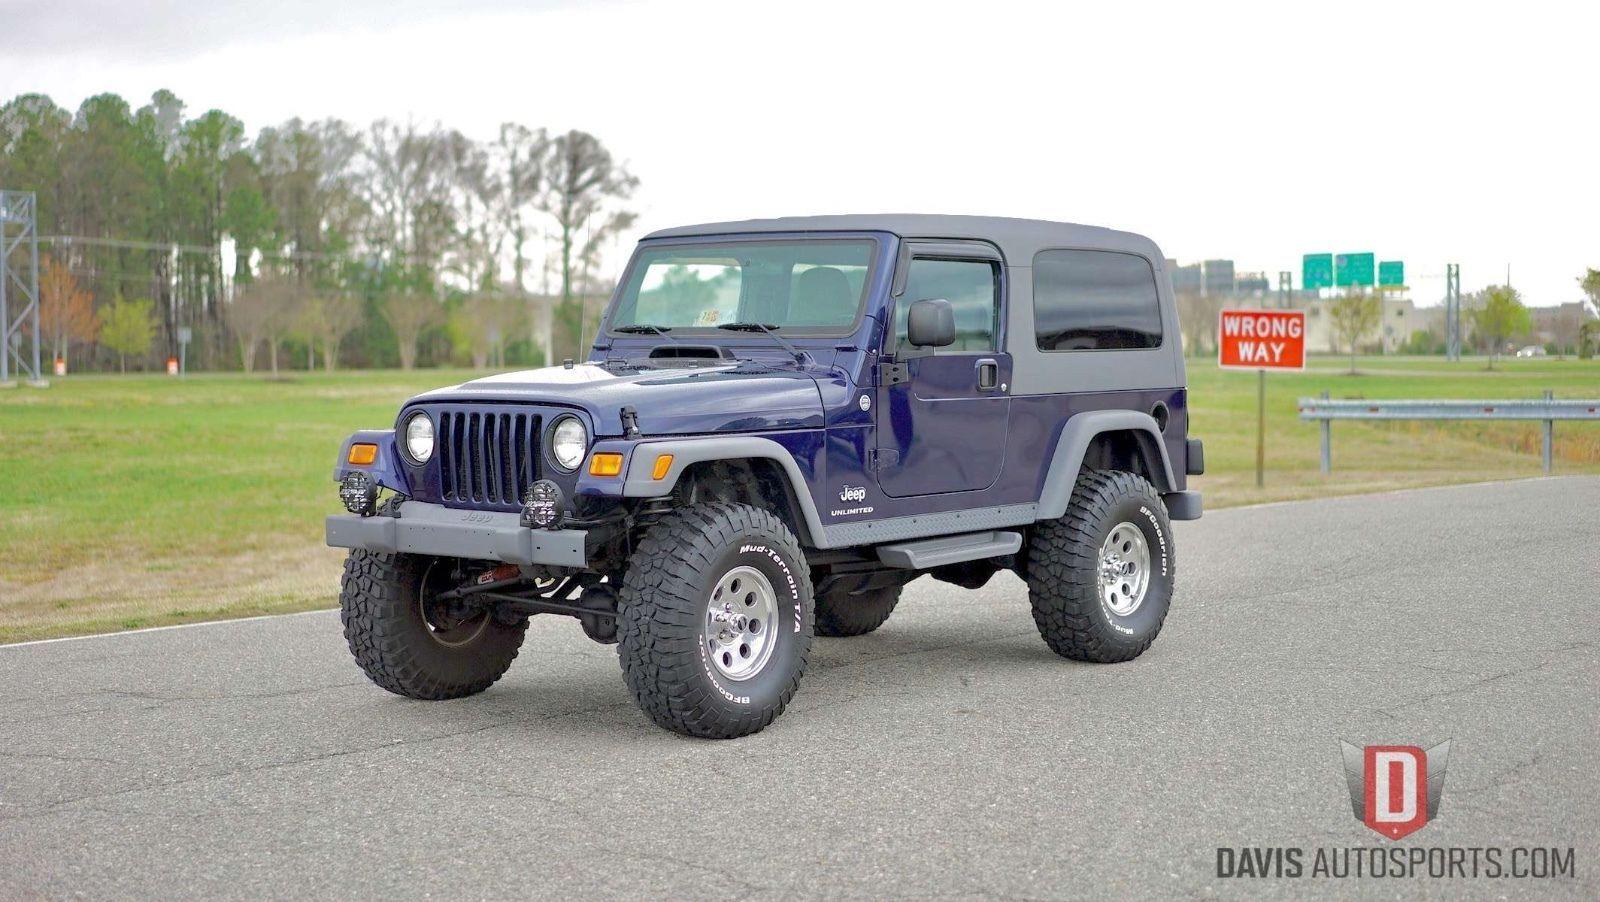 Ebay 2006 jeep wrangler sport unlimited wrangler lj lifted bfg 35 tires